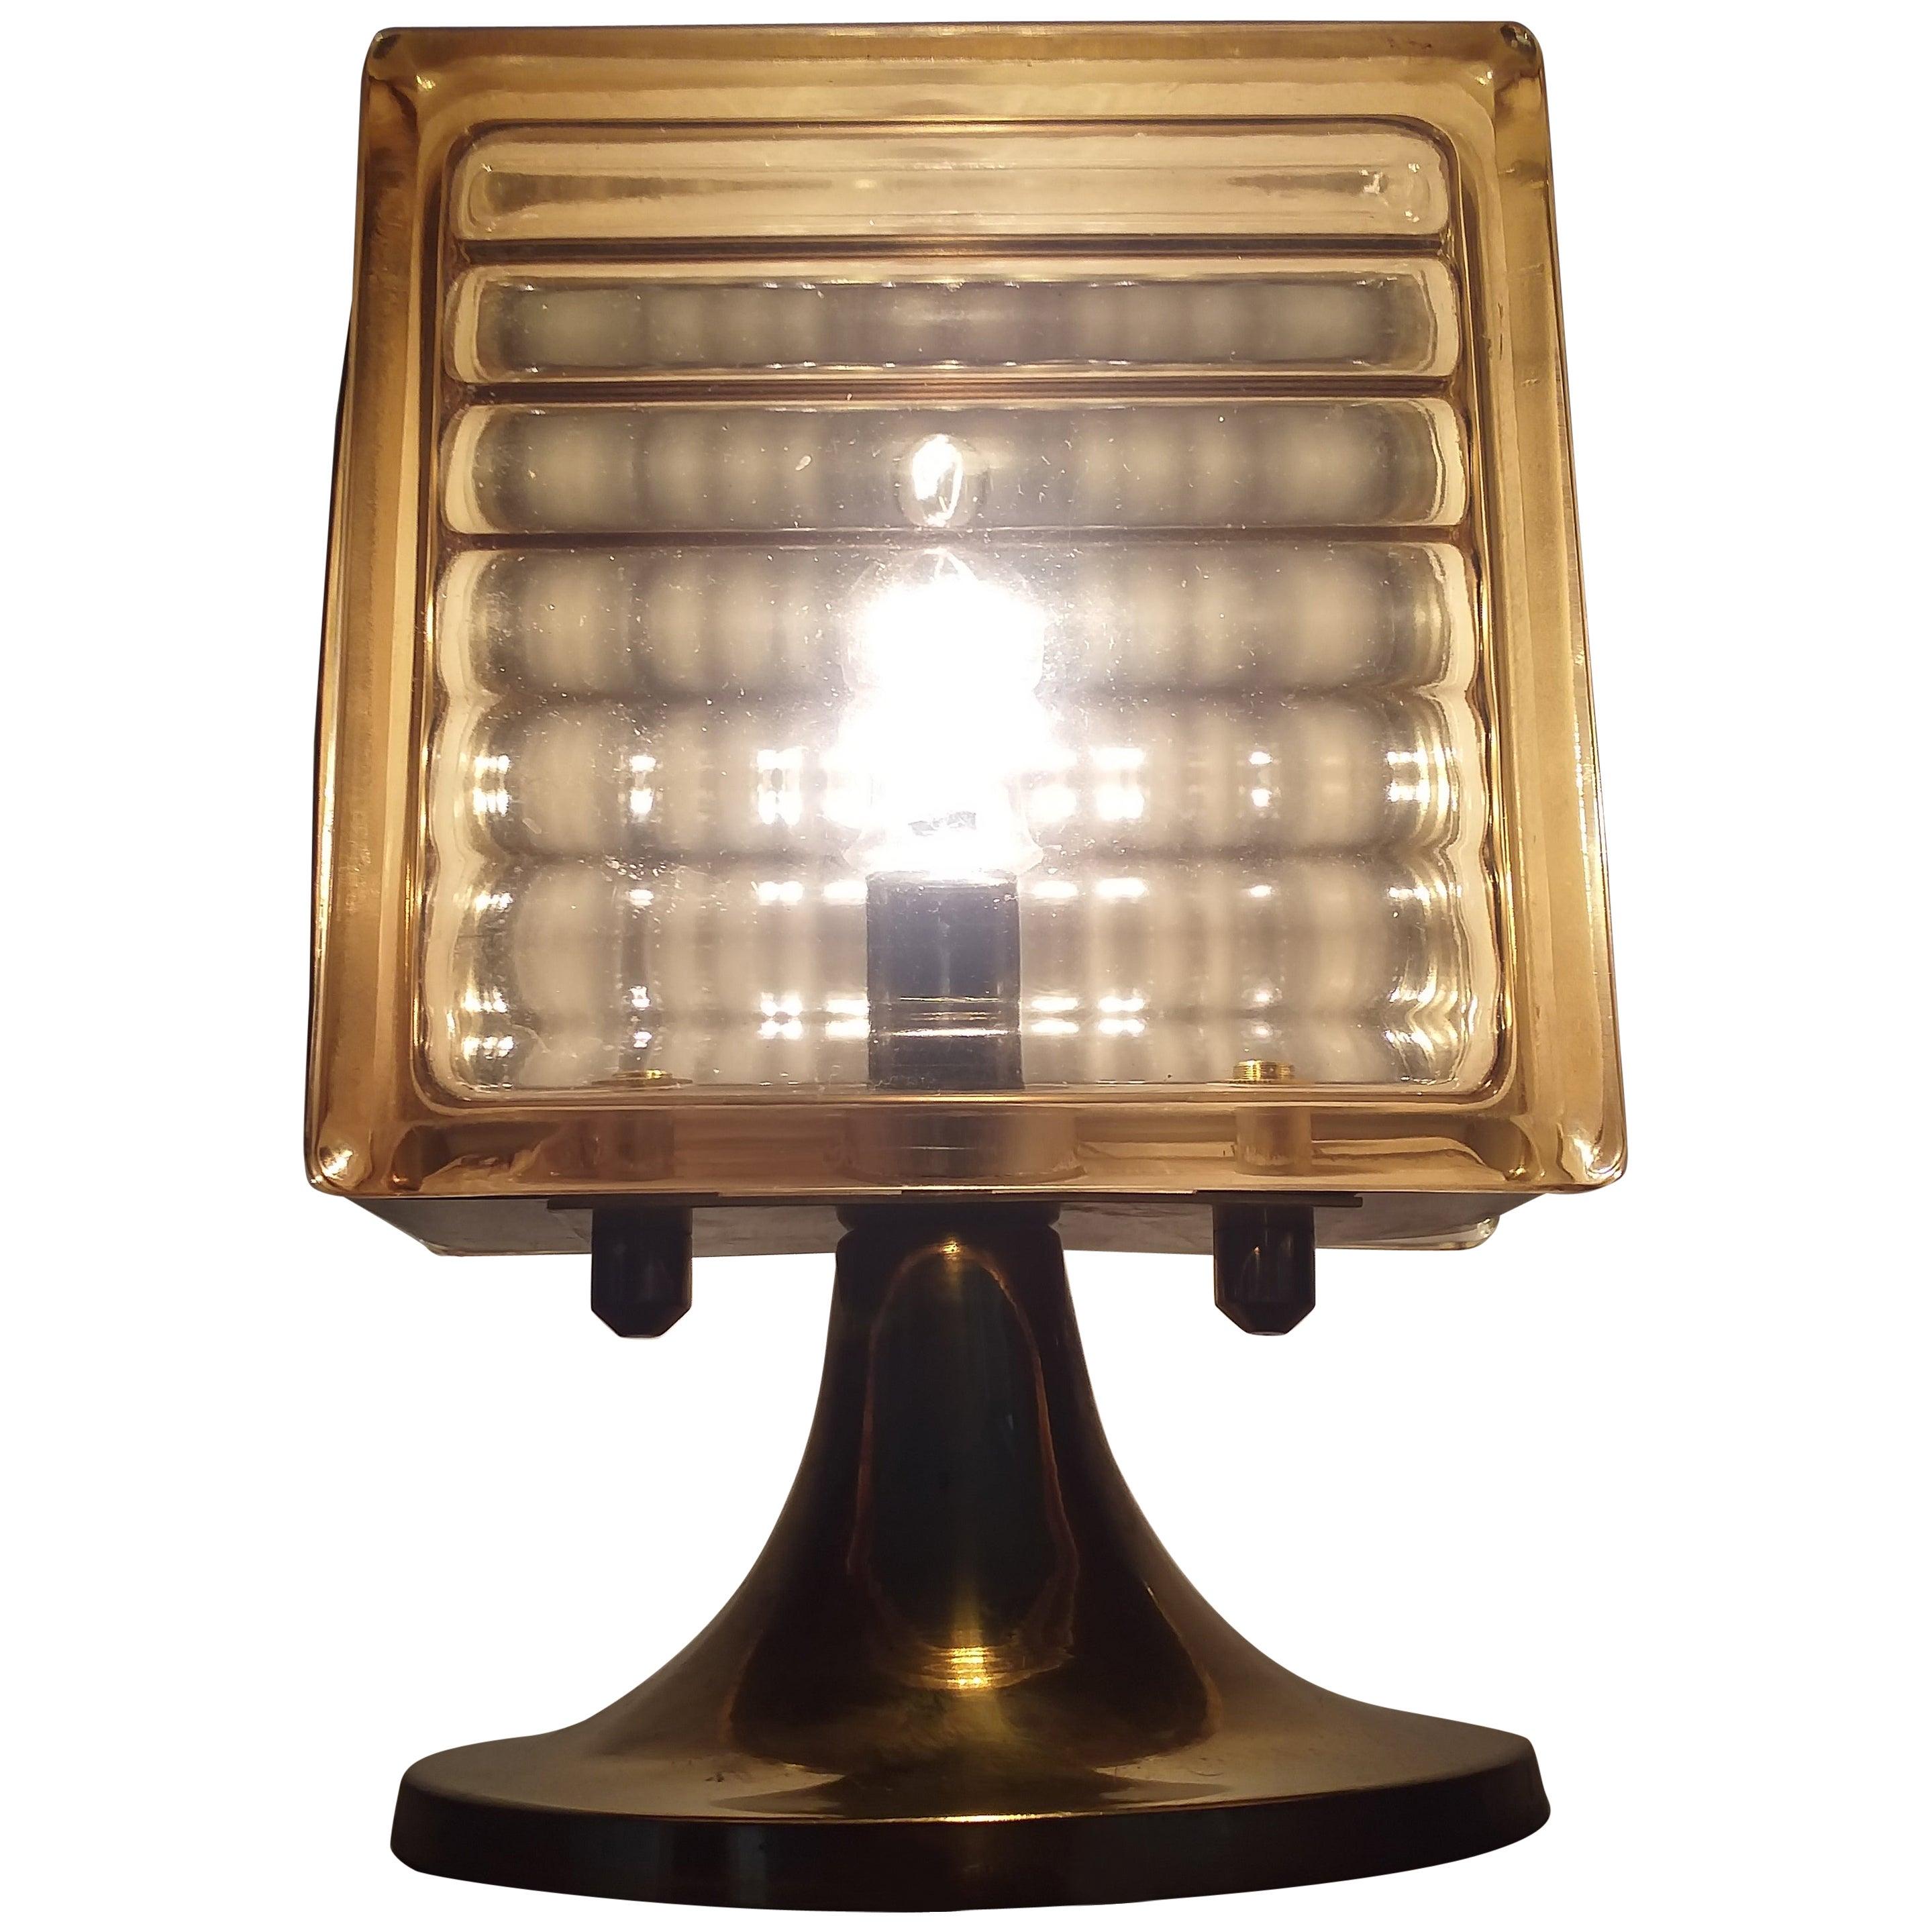 Rare Midcentury Table Lamp, 1960s